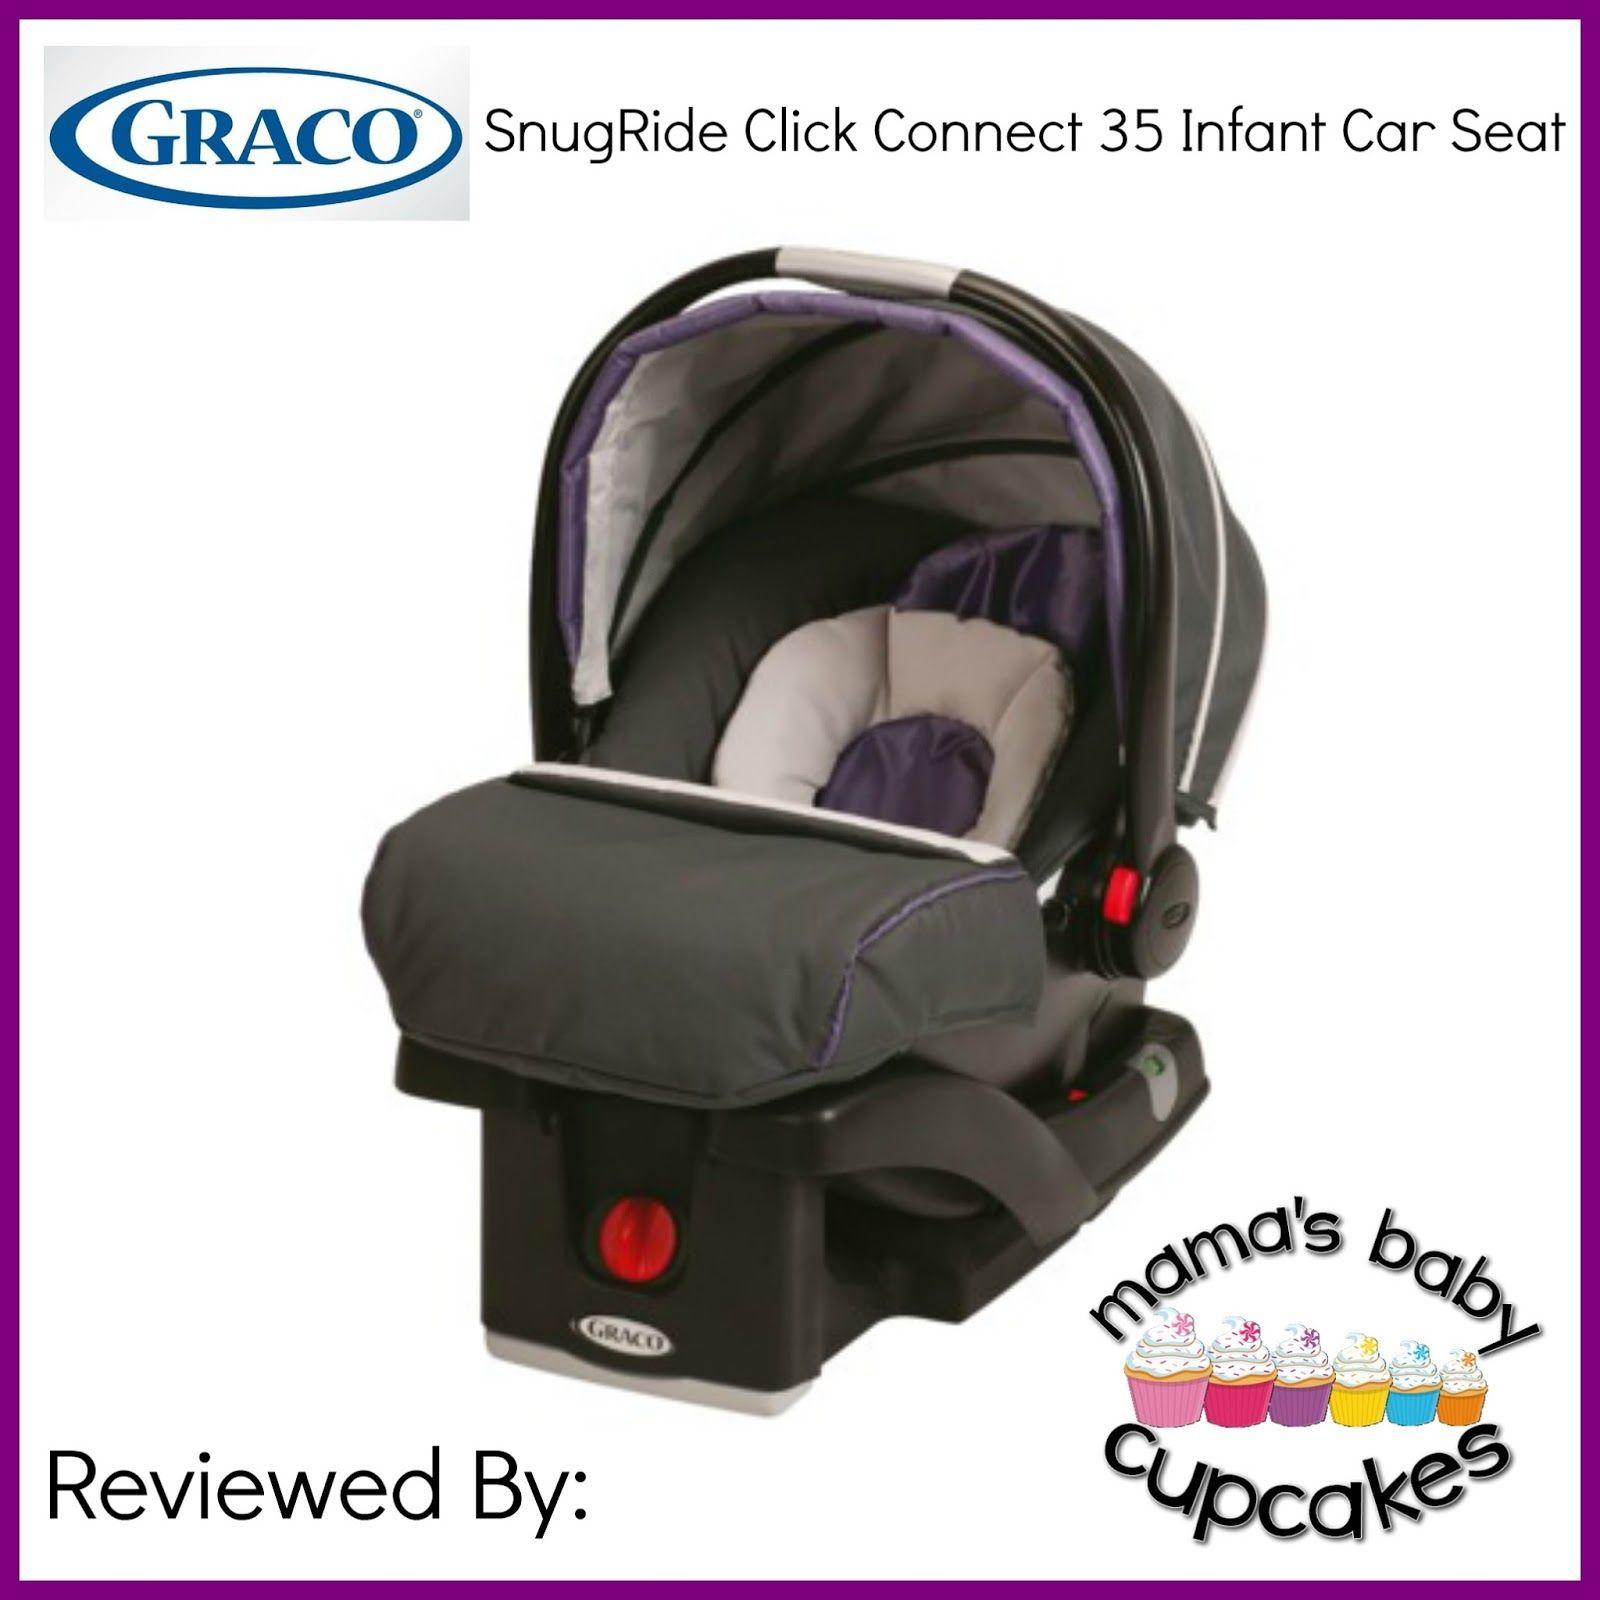 Graco SnugRide Click Connect 35 Infant Car Seat Giveaway – ends 2/17 ...